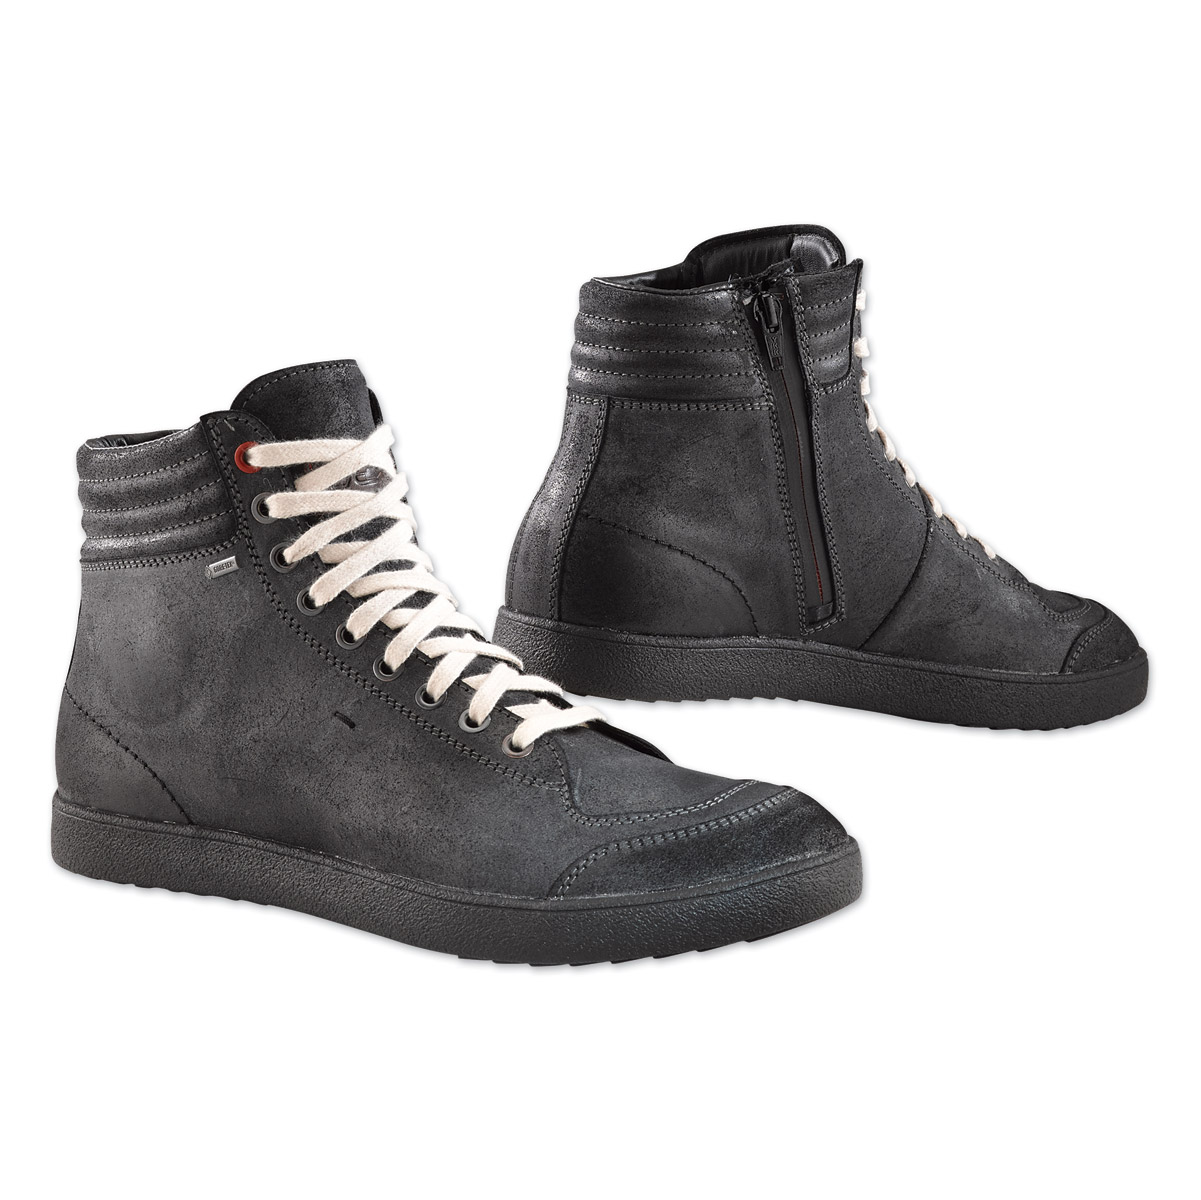 TCX X-Groove Gore-Tex Men's Black Shoes